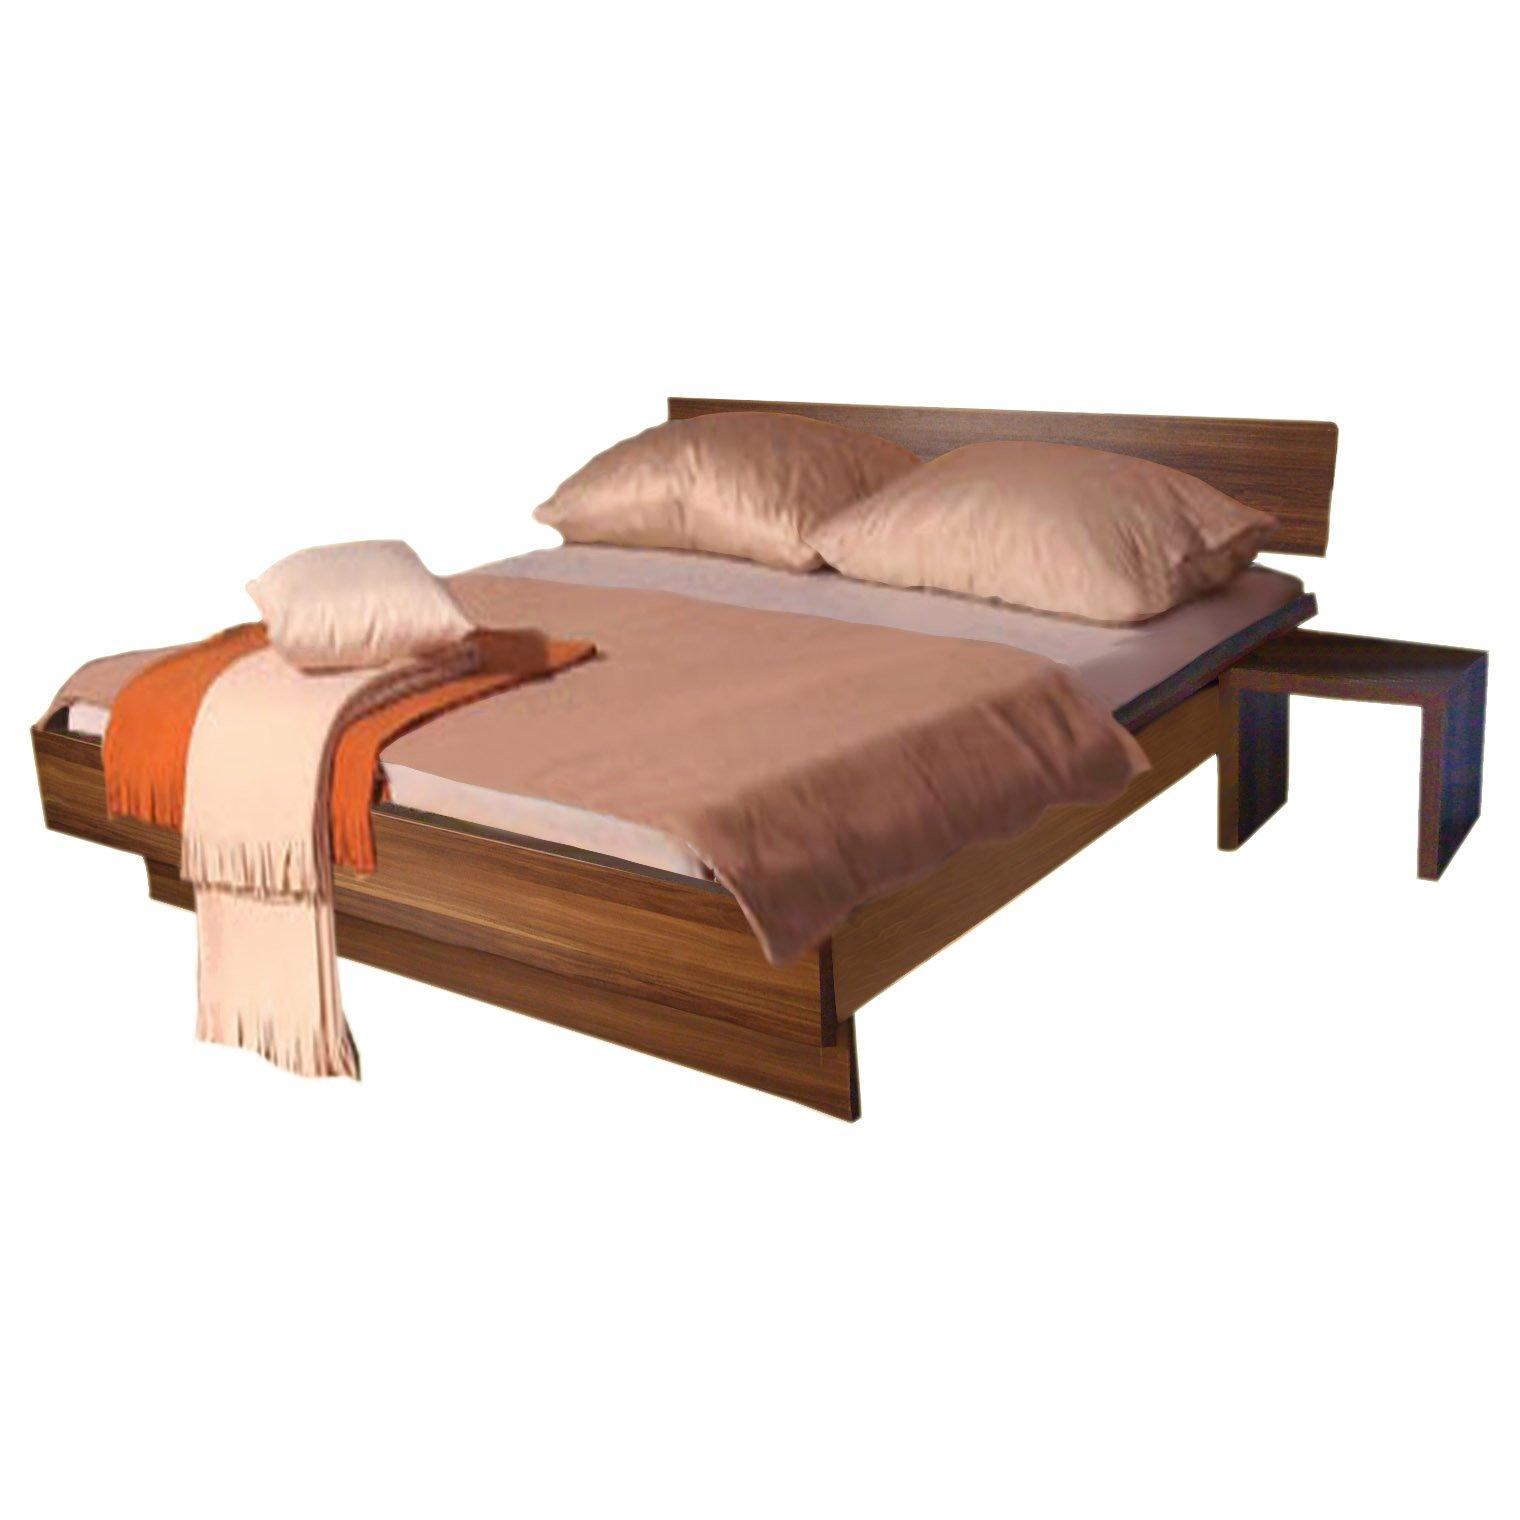 Full Size of Dublin Doppelbett Ruf Bett Matratze 200x200 Mit Bettkasten Lattenrost Sitzbank Paidi Weisses 190x90 2x2m Wand Steens 220 X 200 180x200 Weiß Stauraum 160x200 Bett Rückenlehne Bett